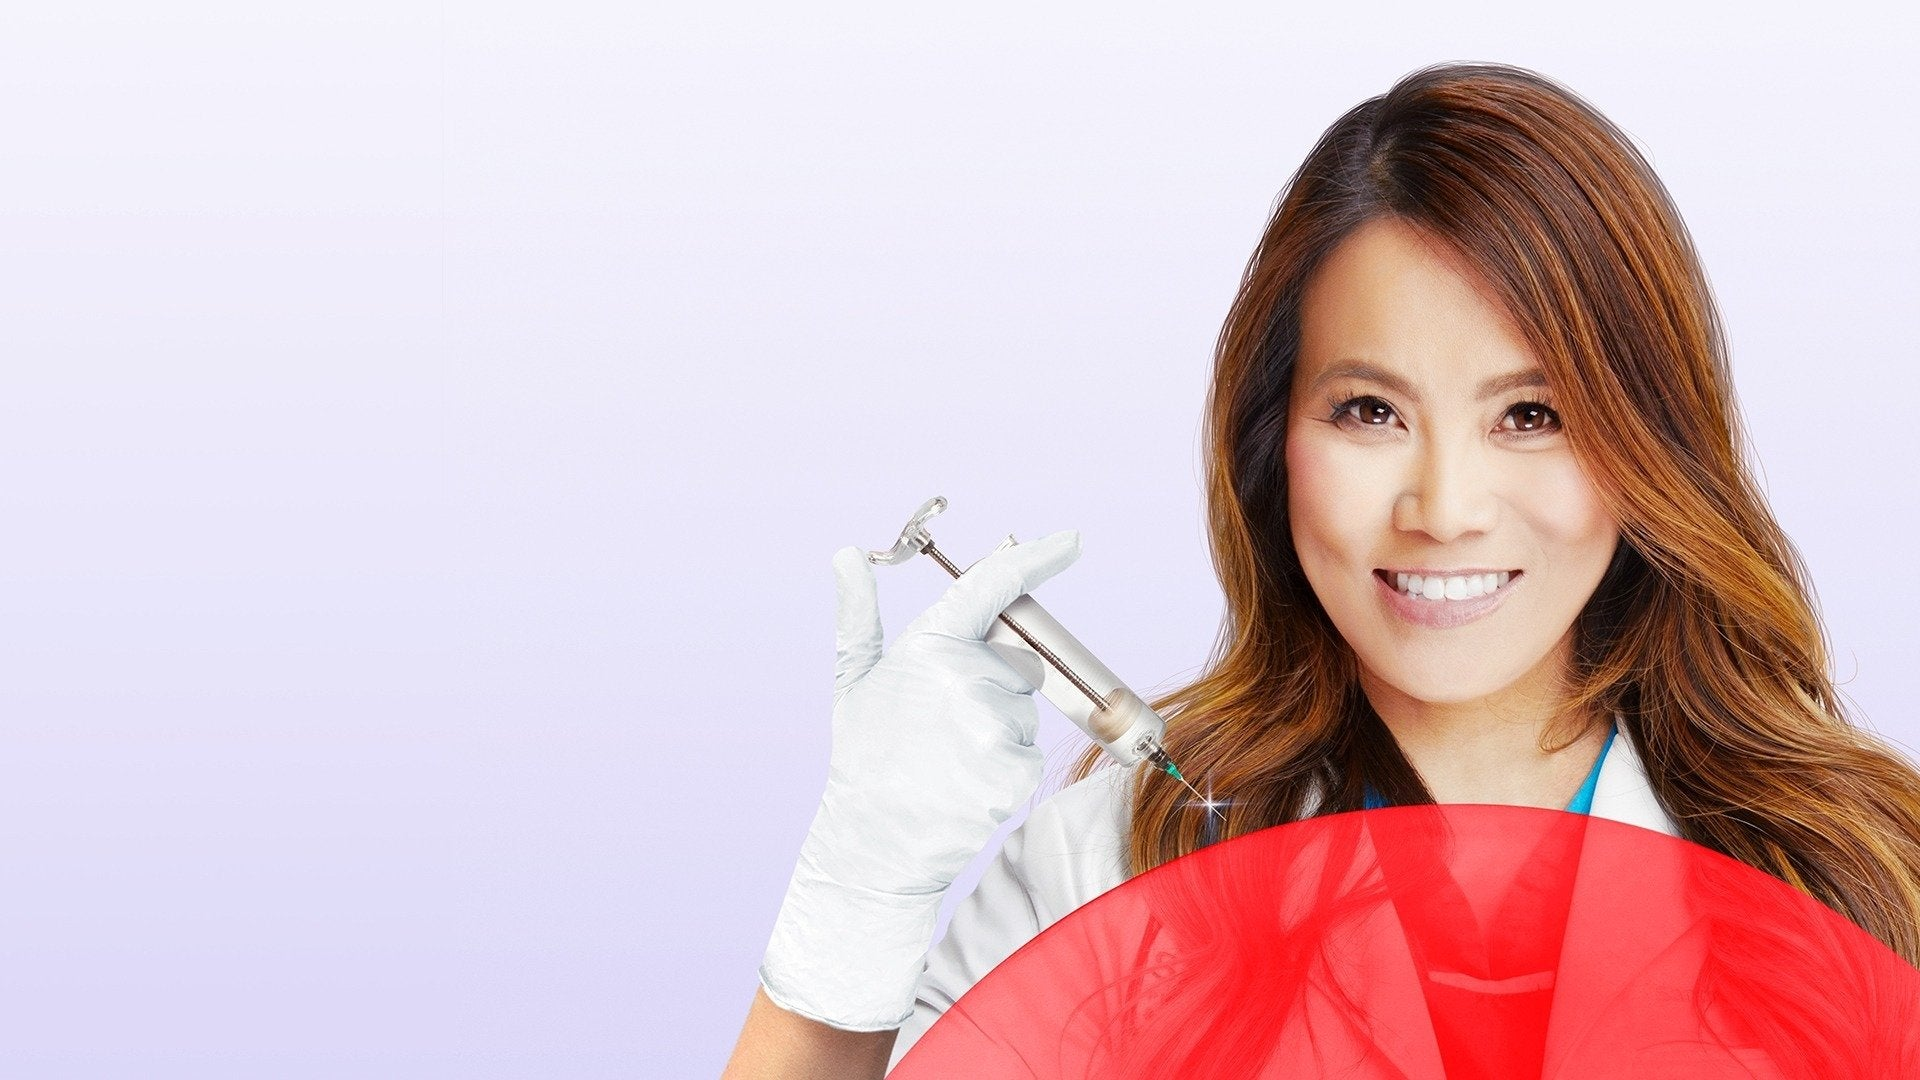 Dr. Pimple Popper: The Poppy Bowl